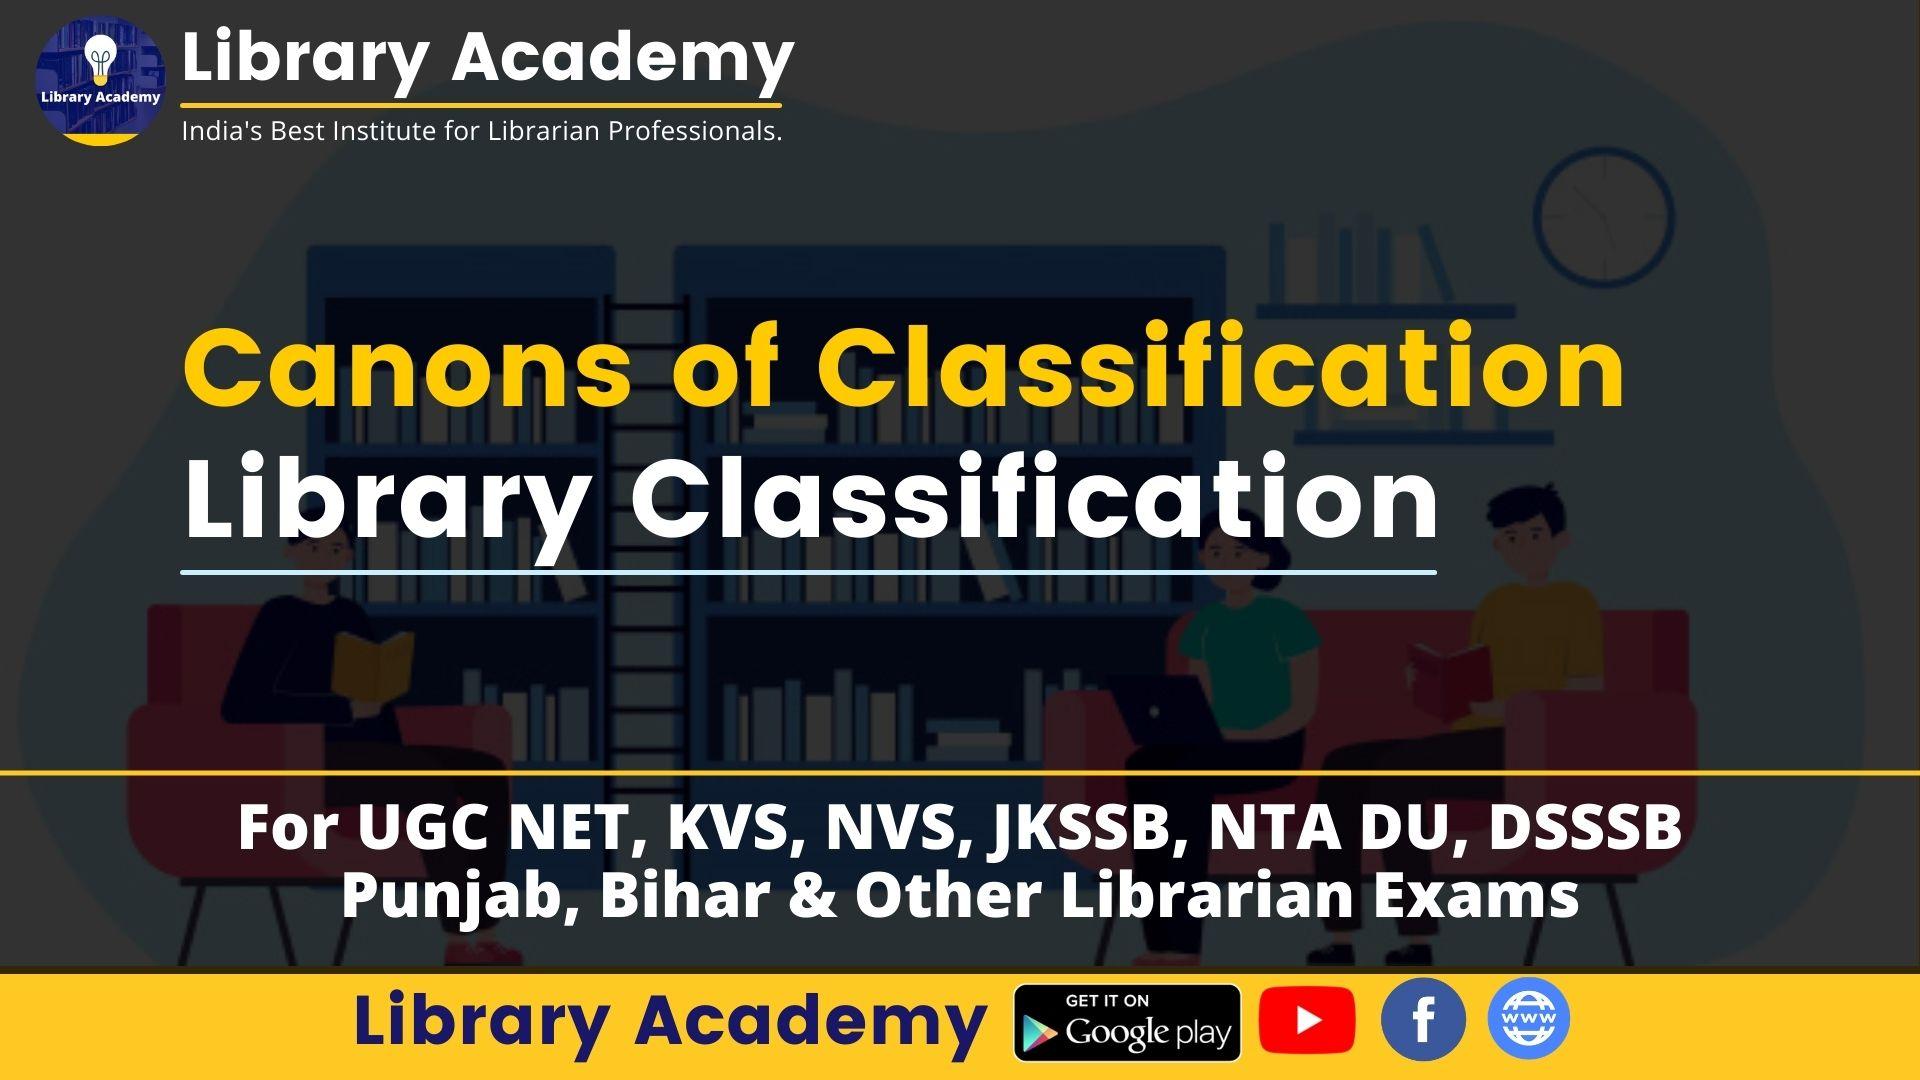 Canon of Classification